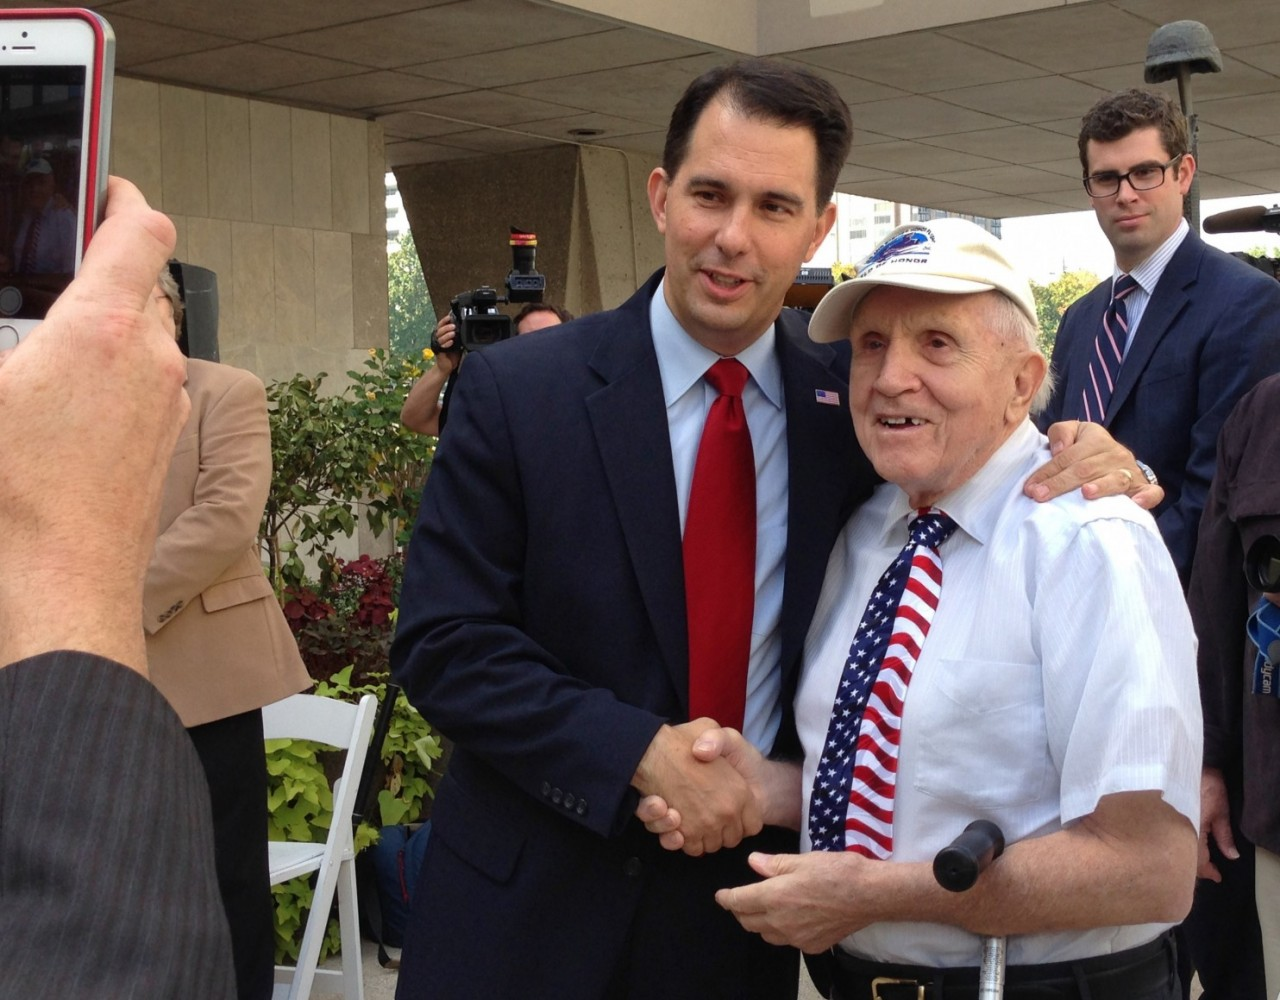 Wisconsin Gov. Scott Walker's tough fight against Mary Burke will decide 2016 future